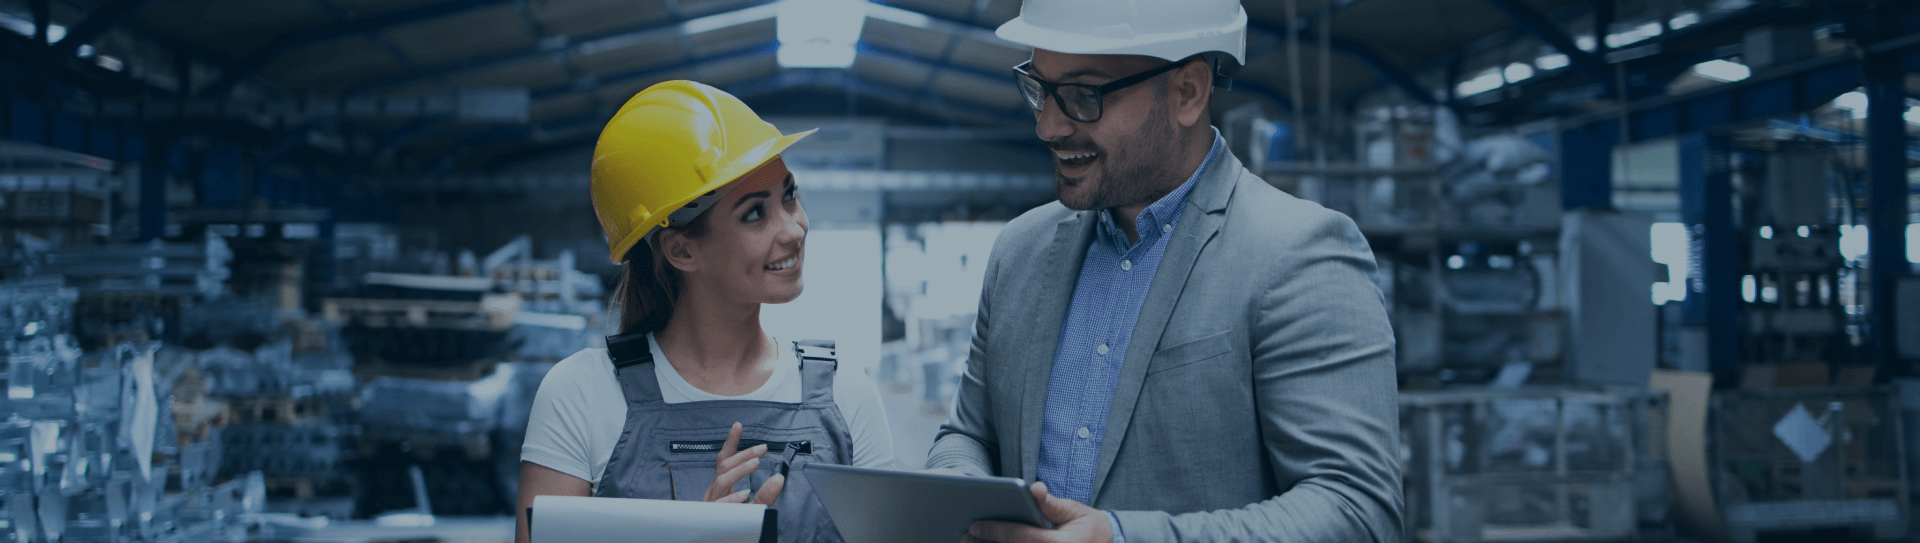 Engineer Insurance